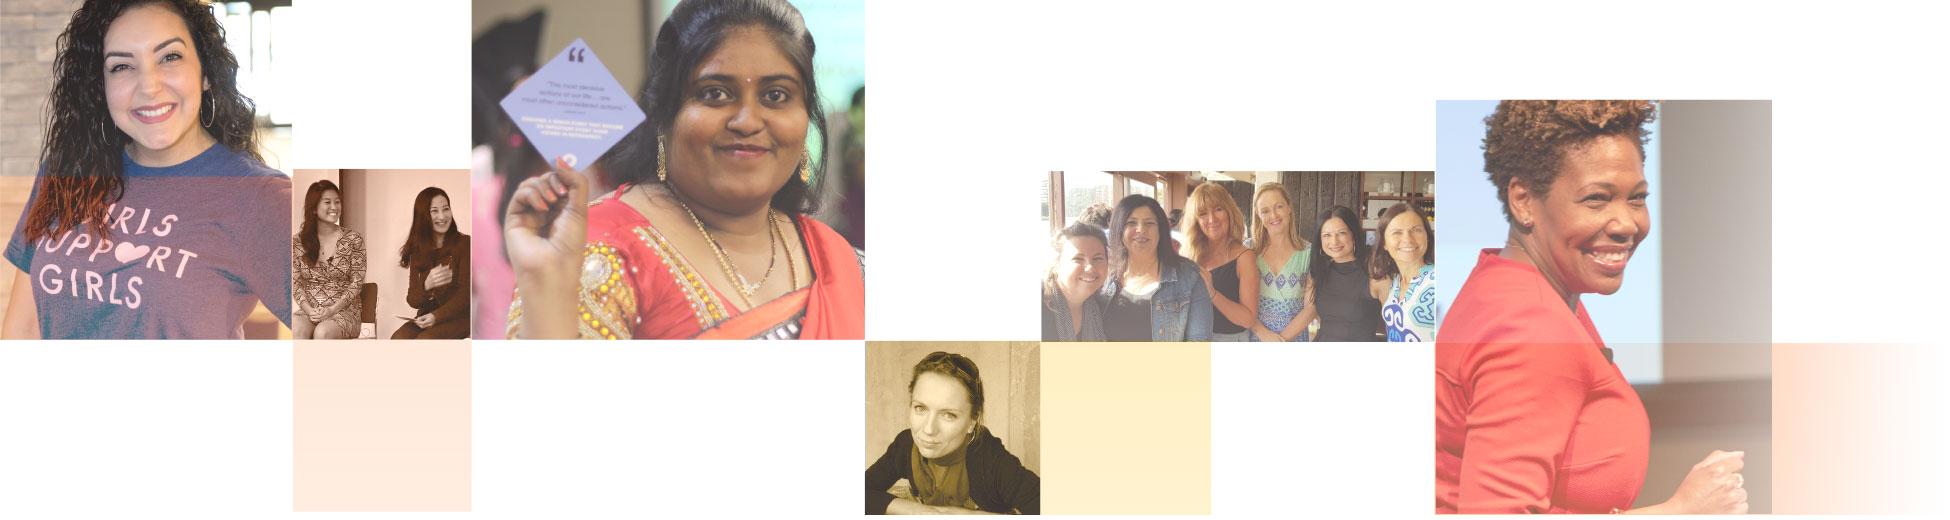 Fossil Group Globally Celebrates International Women's Day